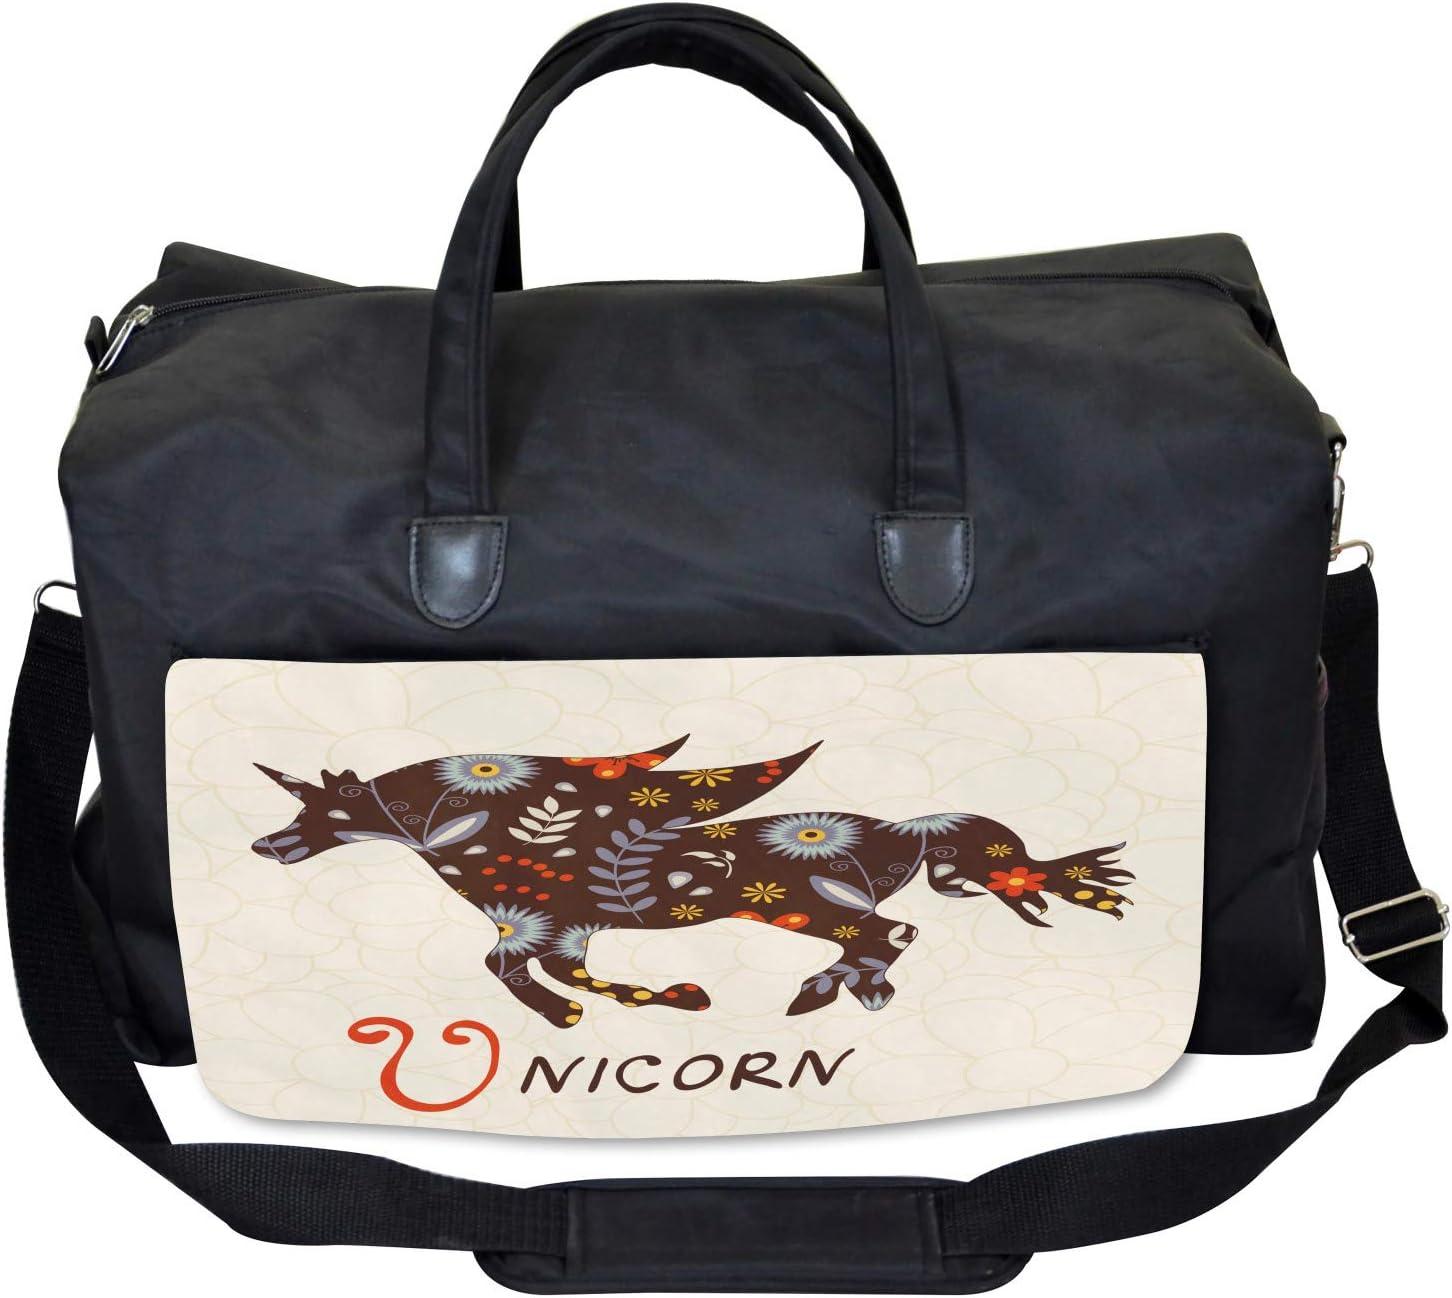 Floral Boho Vintage Large Weekender Carry-on Ambesonne Unicorn Gym Bag